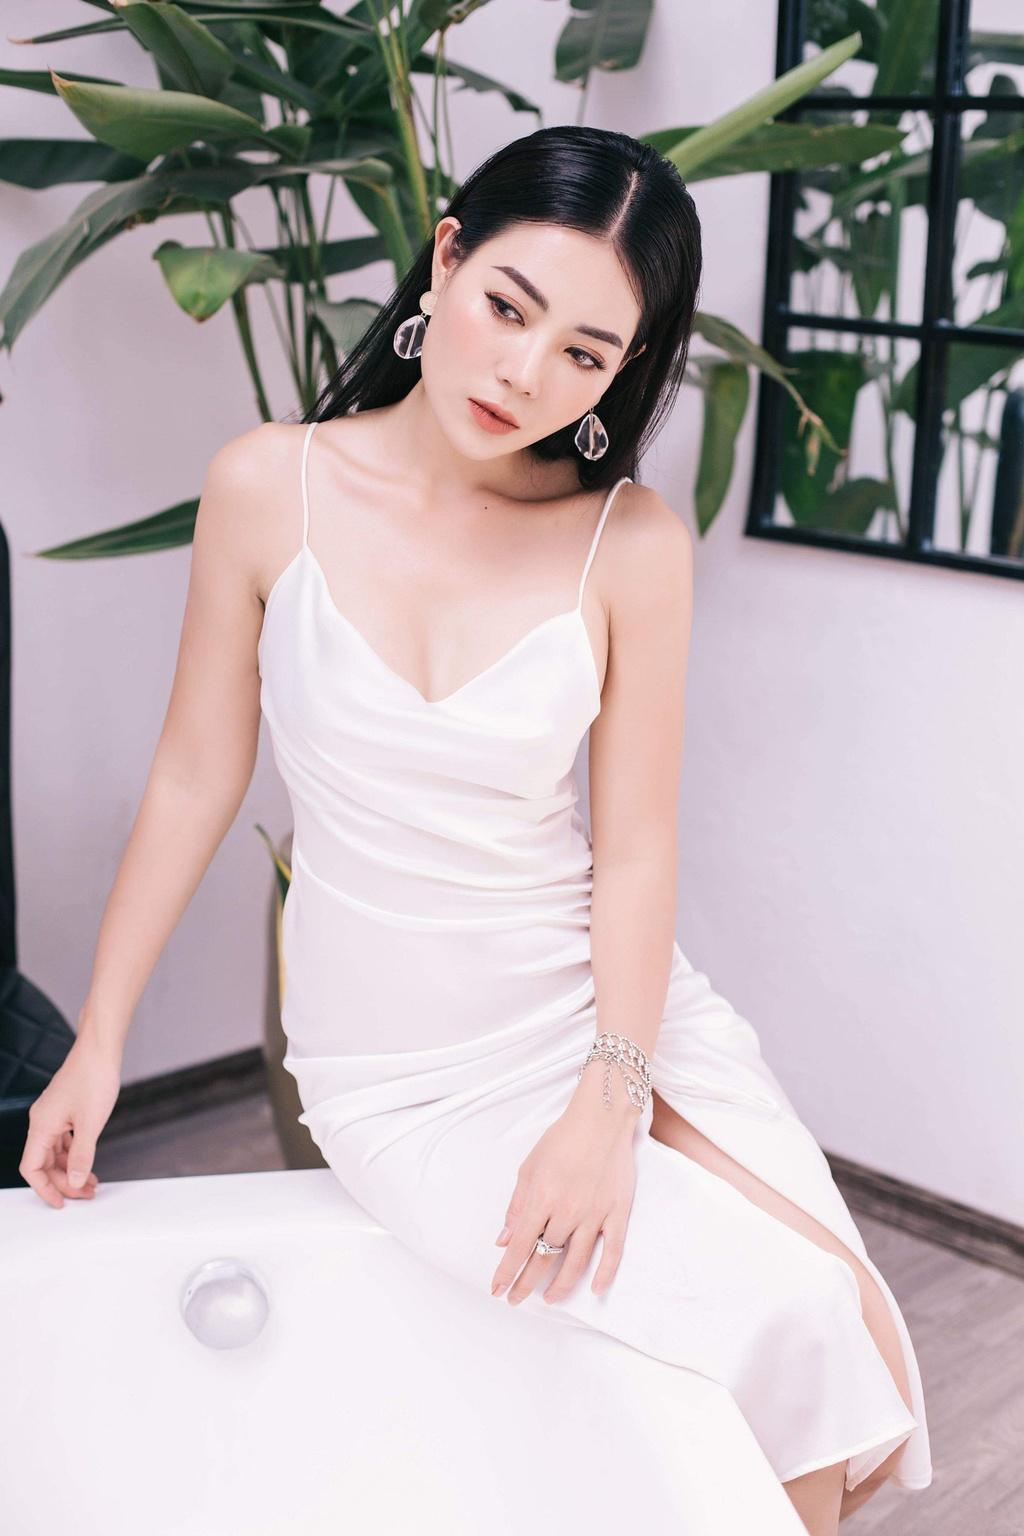 'Lan cave' Thanh Huong: 'Con oa khoc, chong soc khi xem Quynh bup be' hinh anh 4